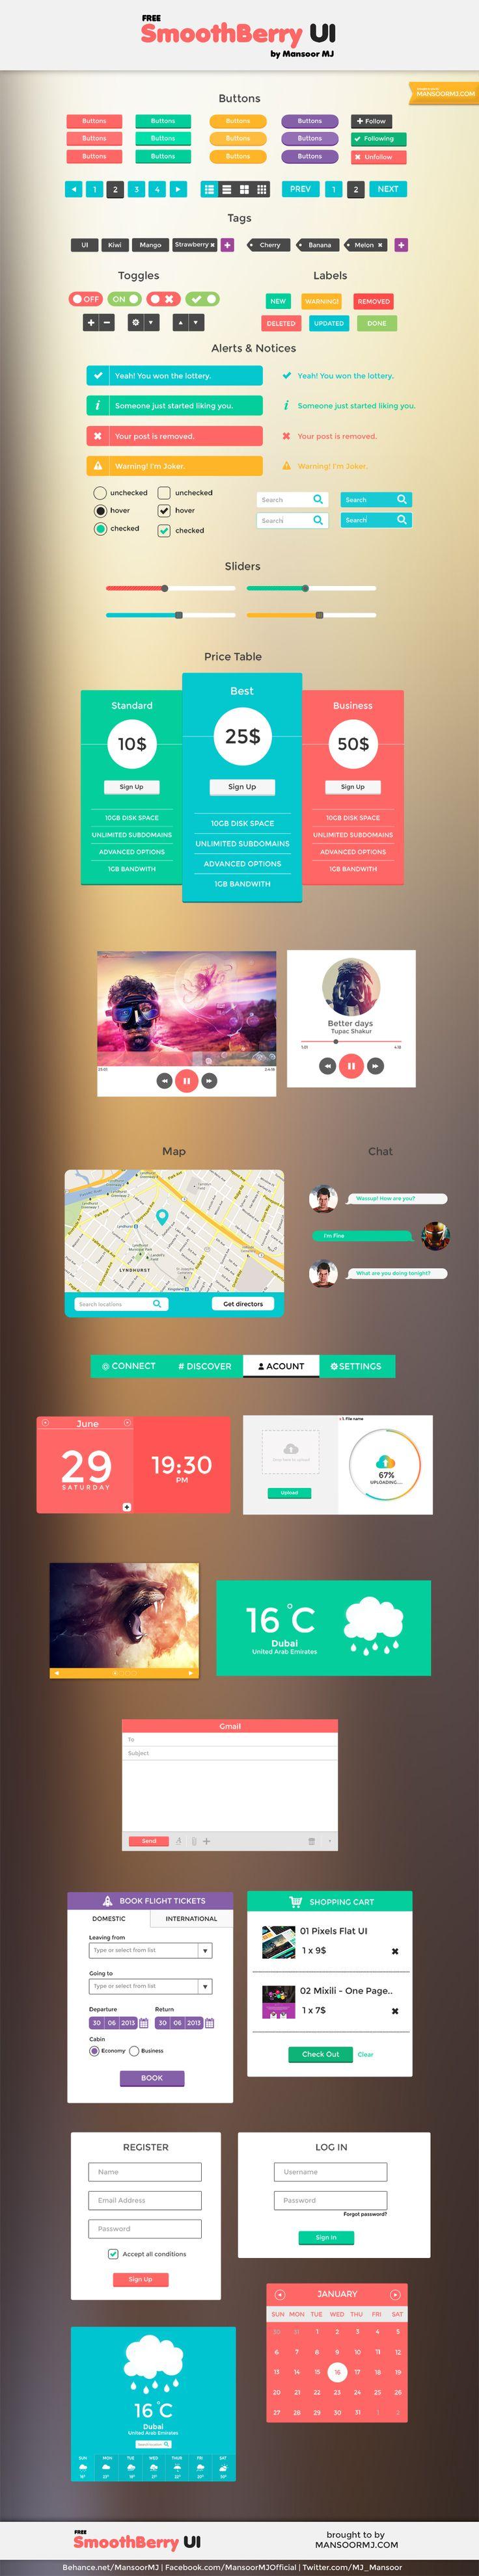 SmoothBerry - Free UI Kit